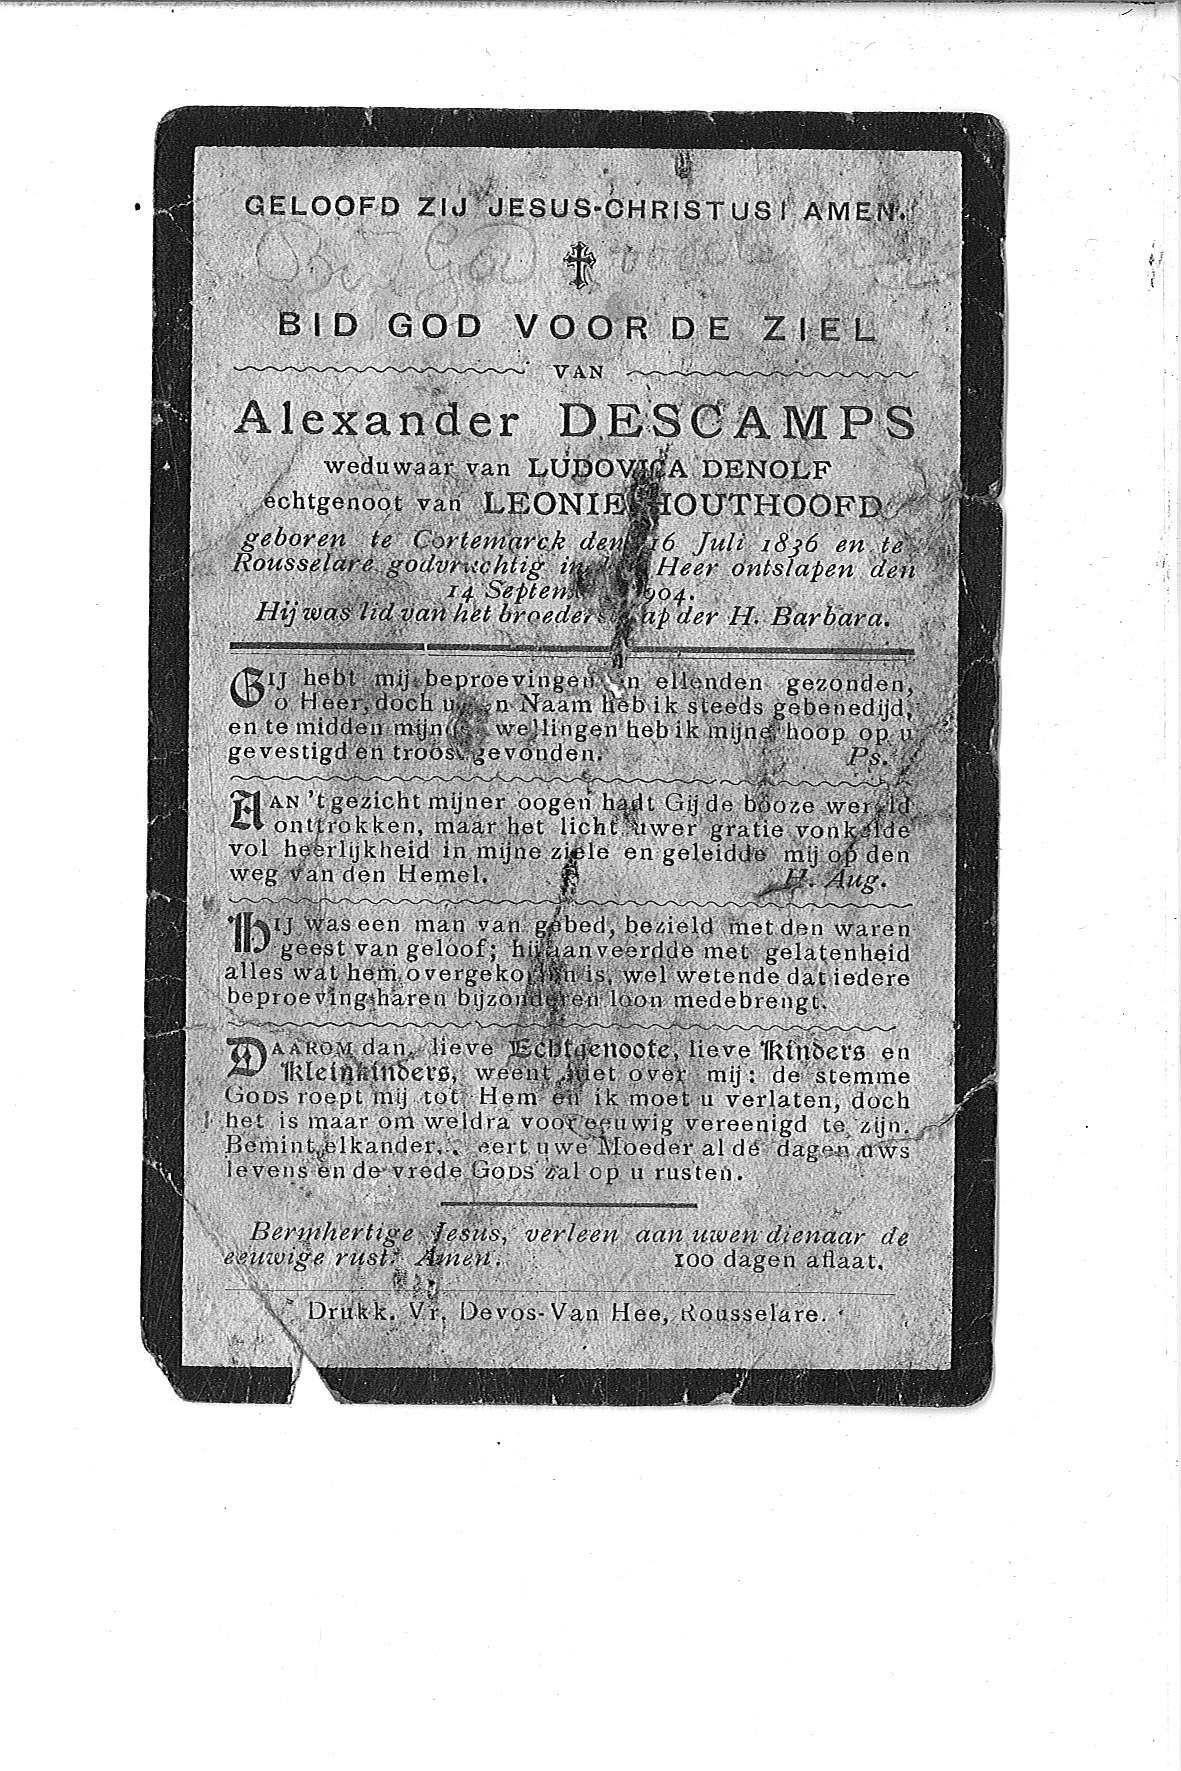 Alexander (1904) 20120224091843_00002.jpg